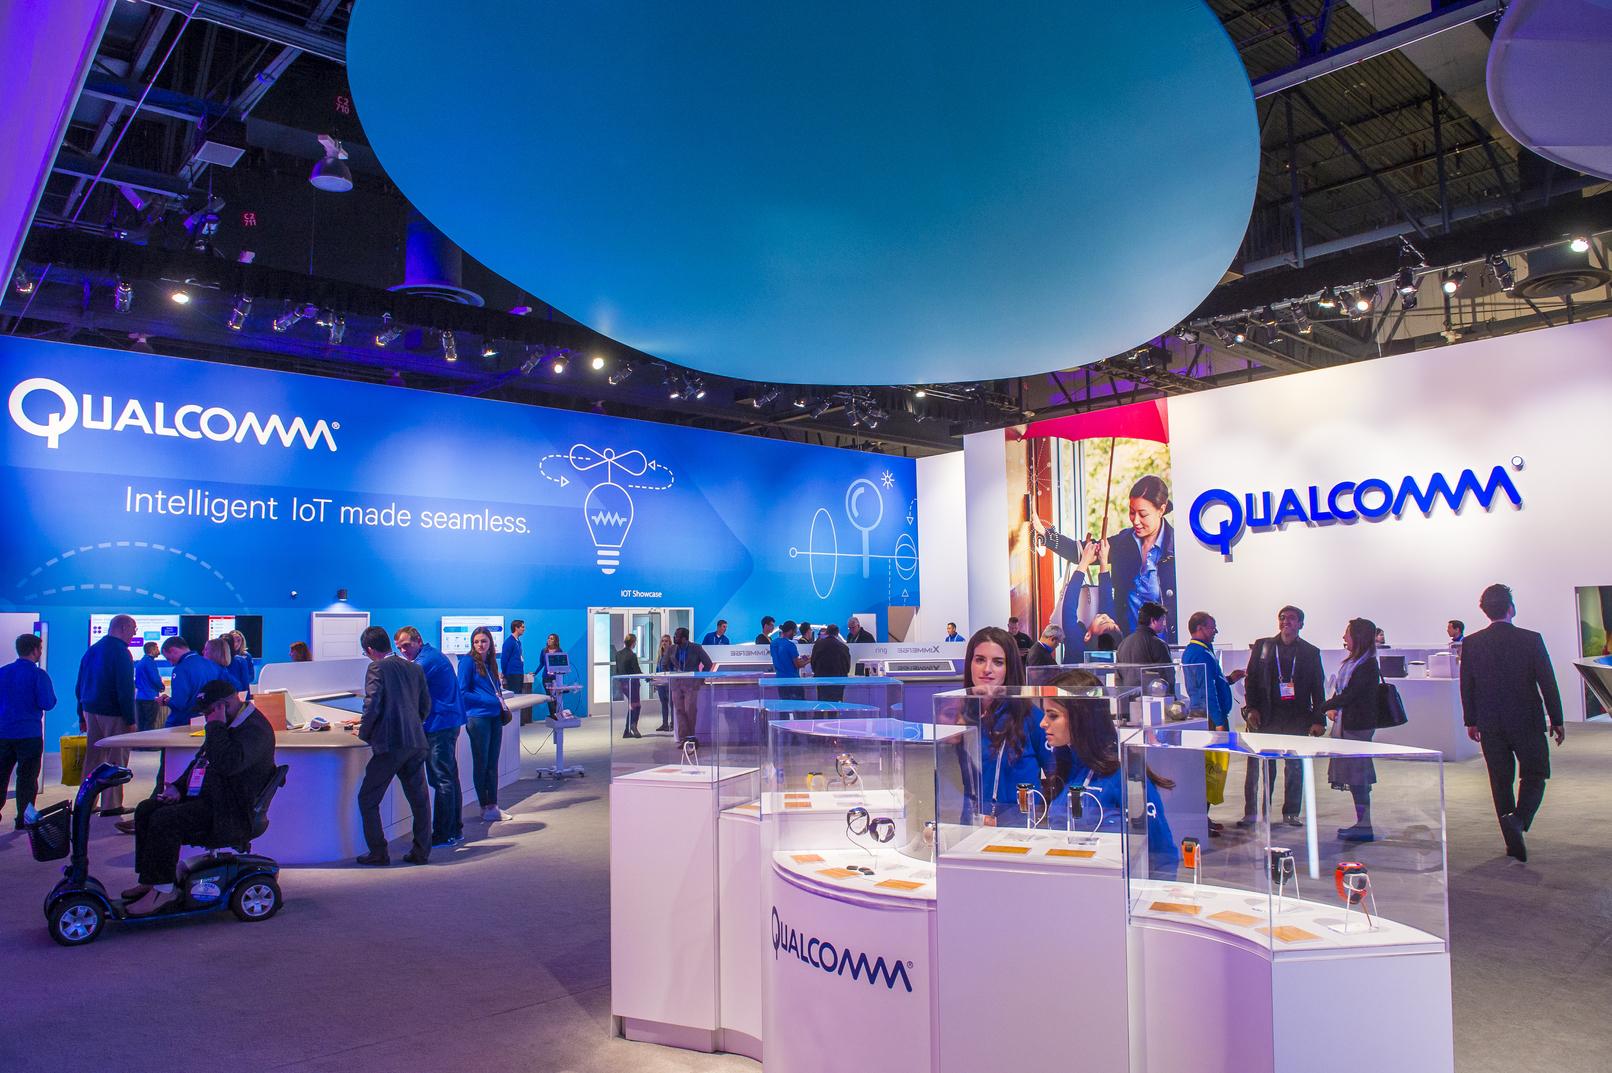 Trump Issues Order Prohibiting Broadcom's Acquisition of Qualcomm